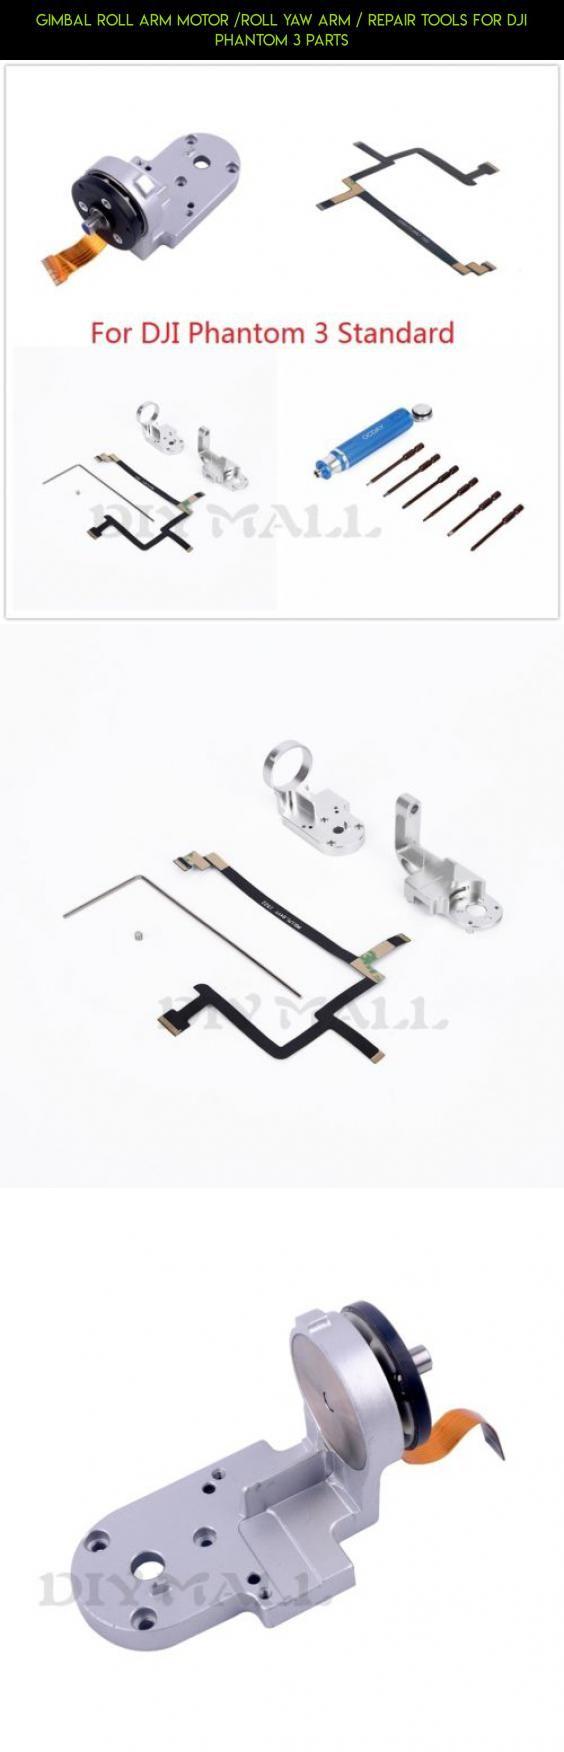 Gimbal Roll Arm Motor /Roll Yaw Arm / Repair Tools For DJI Phantom 3 Parts #tech #parts #kit #standard #tools #3 #fpv #camera #racing #technology #products #gadgets #dji #phantom #drone #plans #shopping